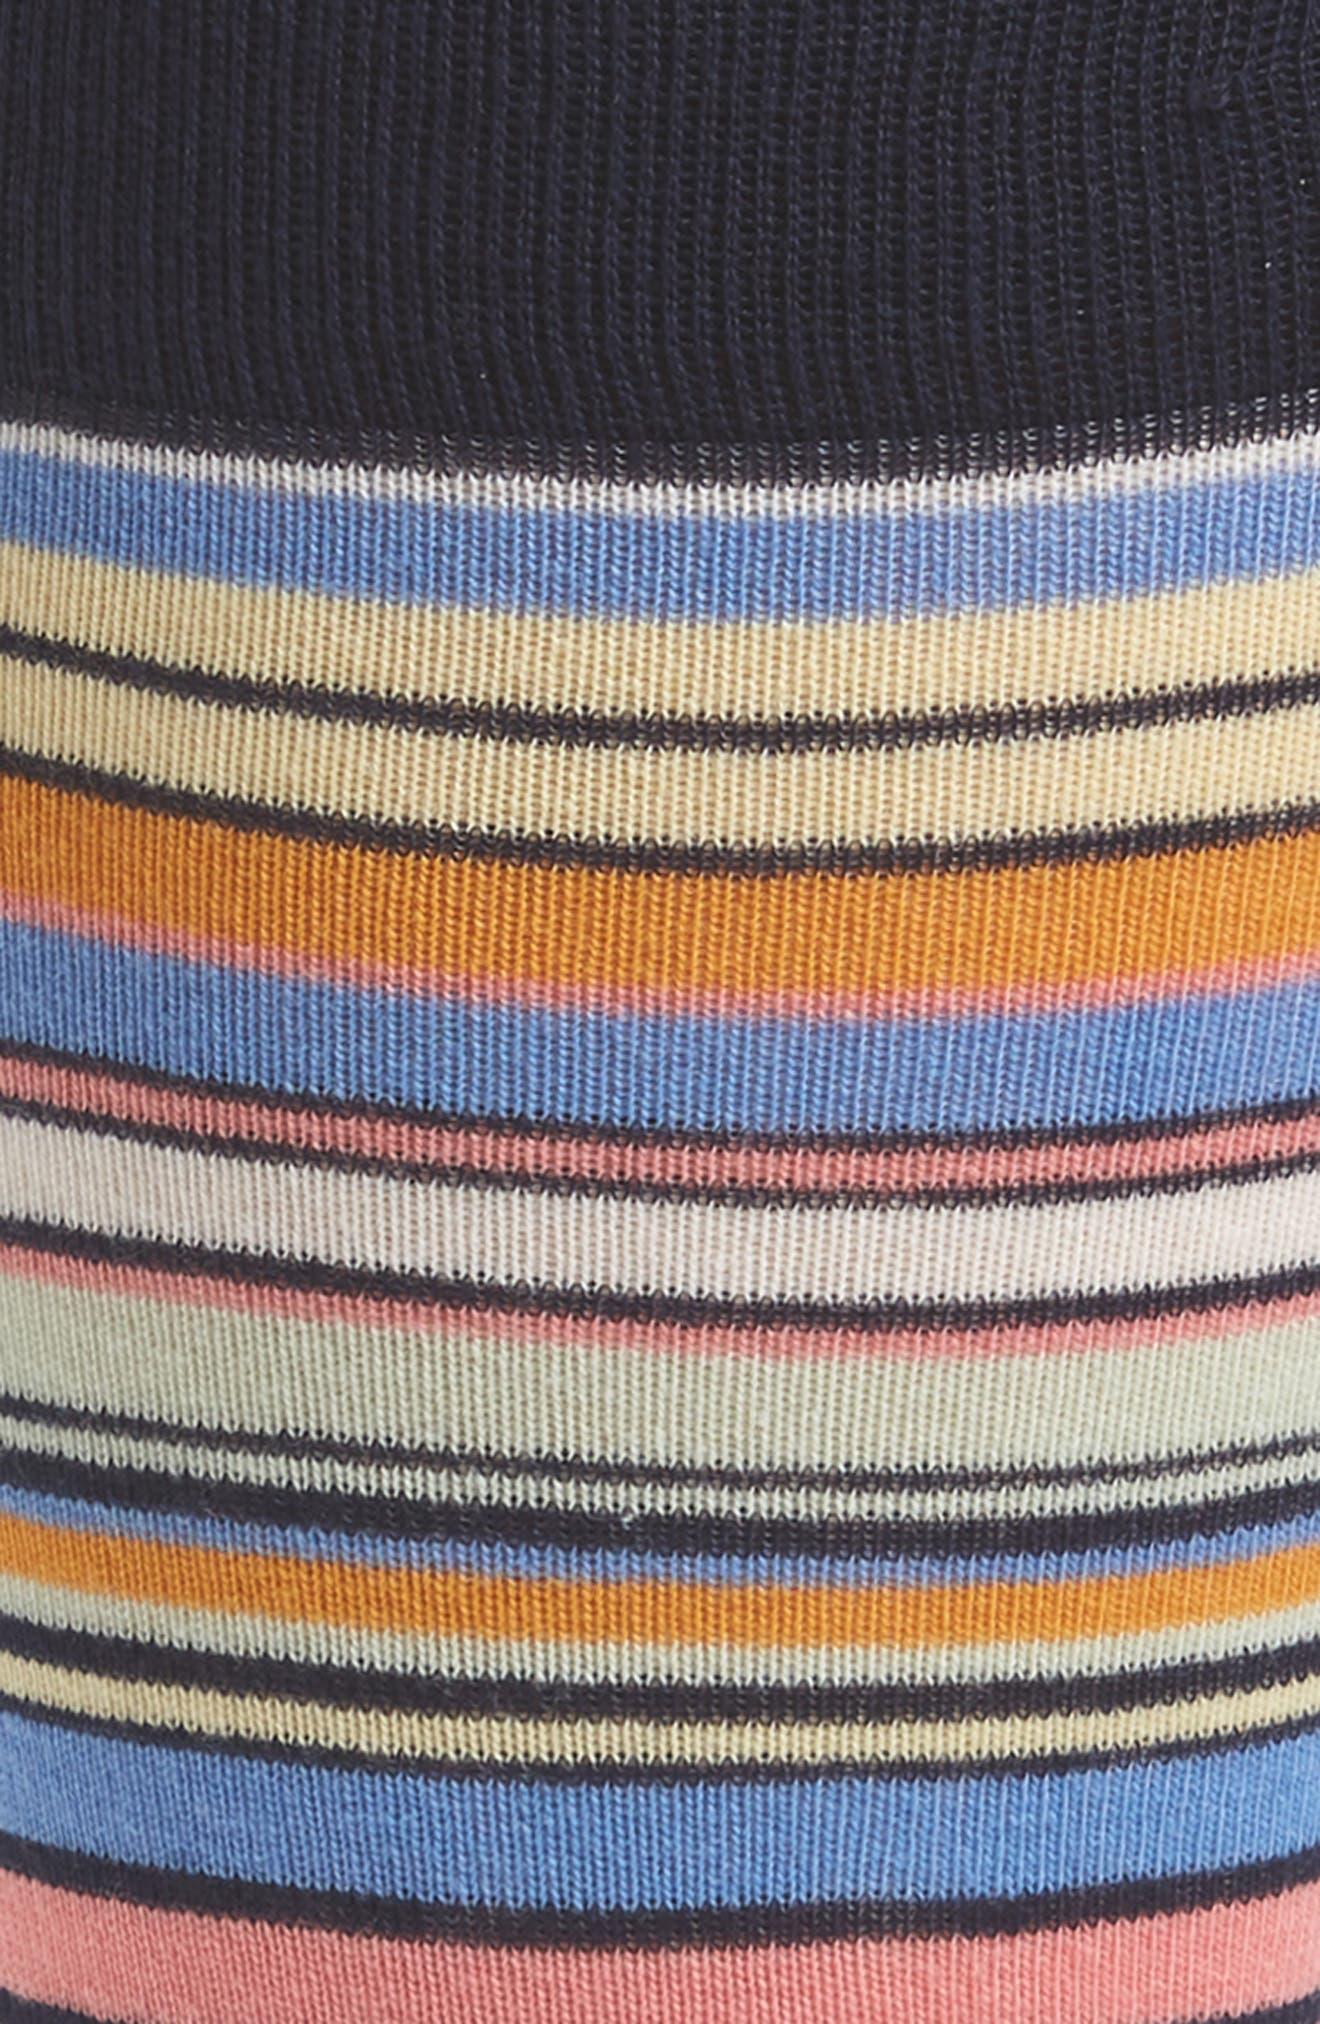 Stripe Socks,                             Alternate thumbnail 2, color,                             NAVY/ PALE YELLOW